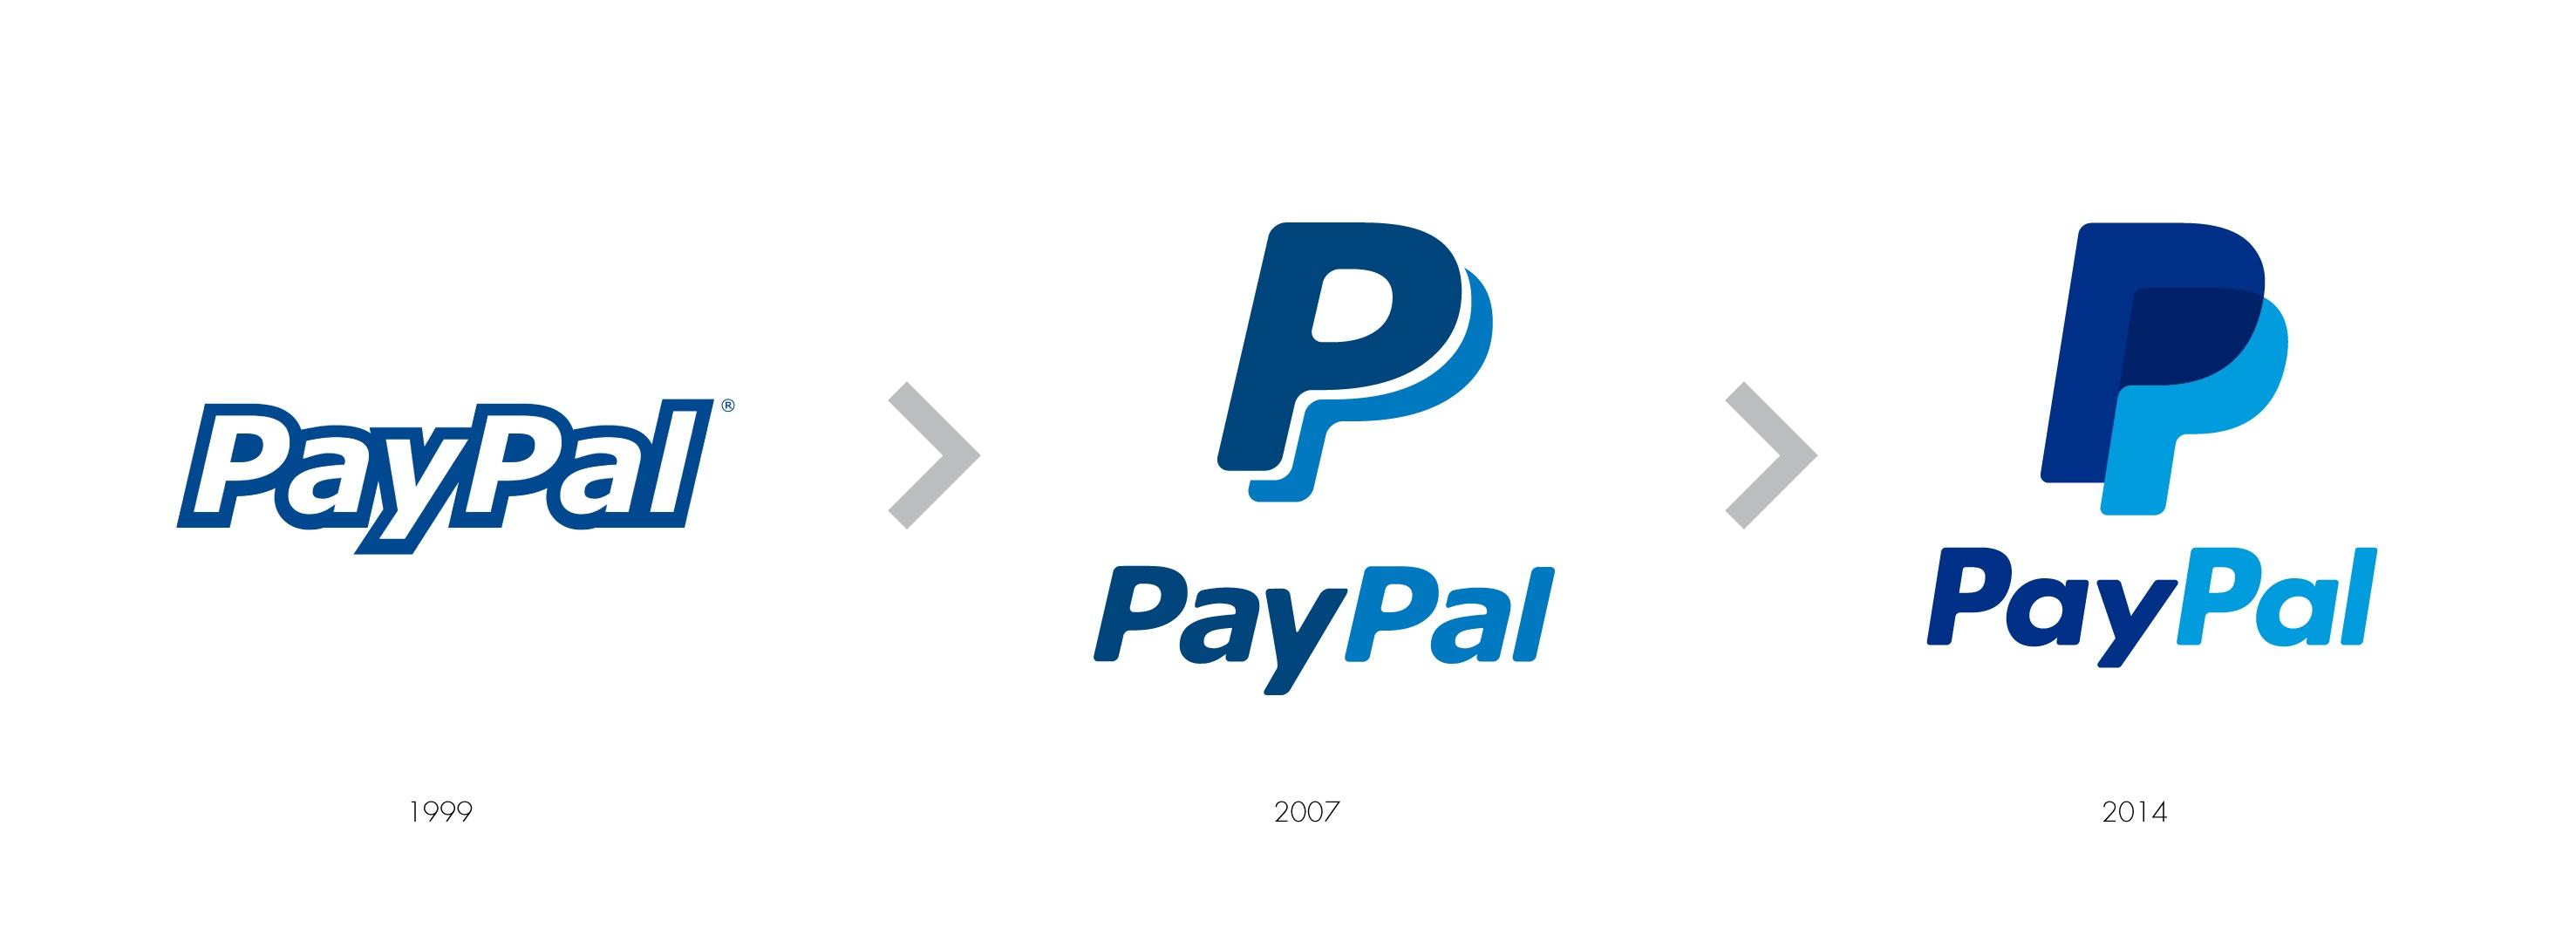 rebranding paypal